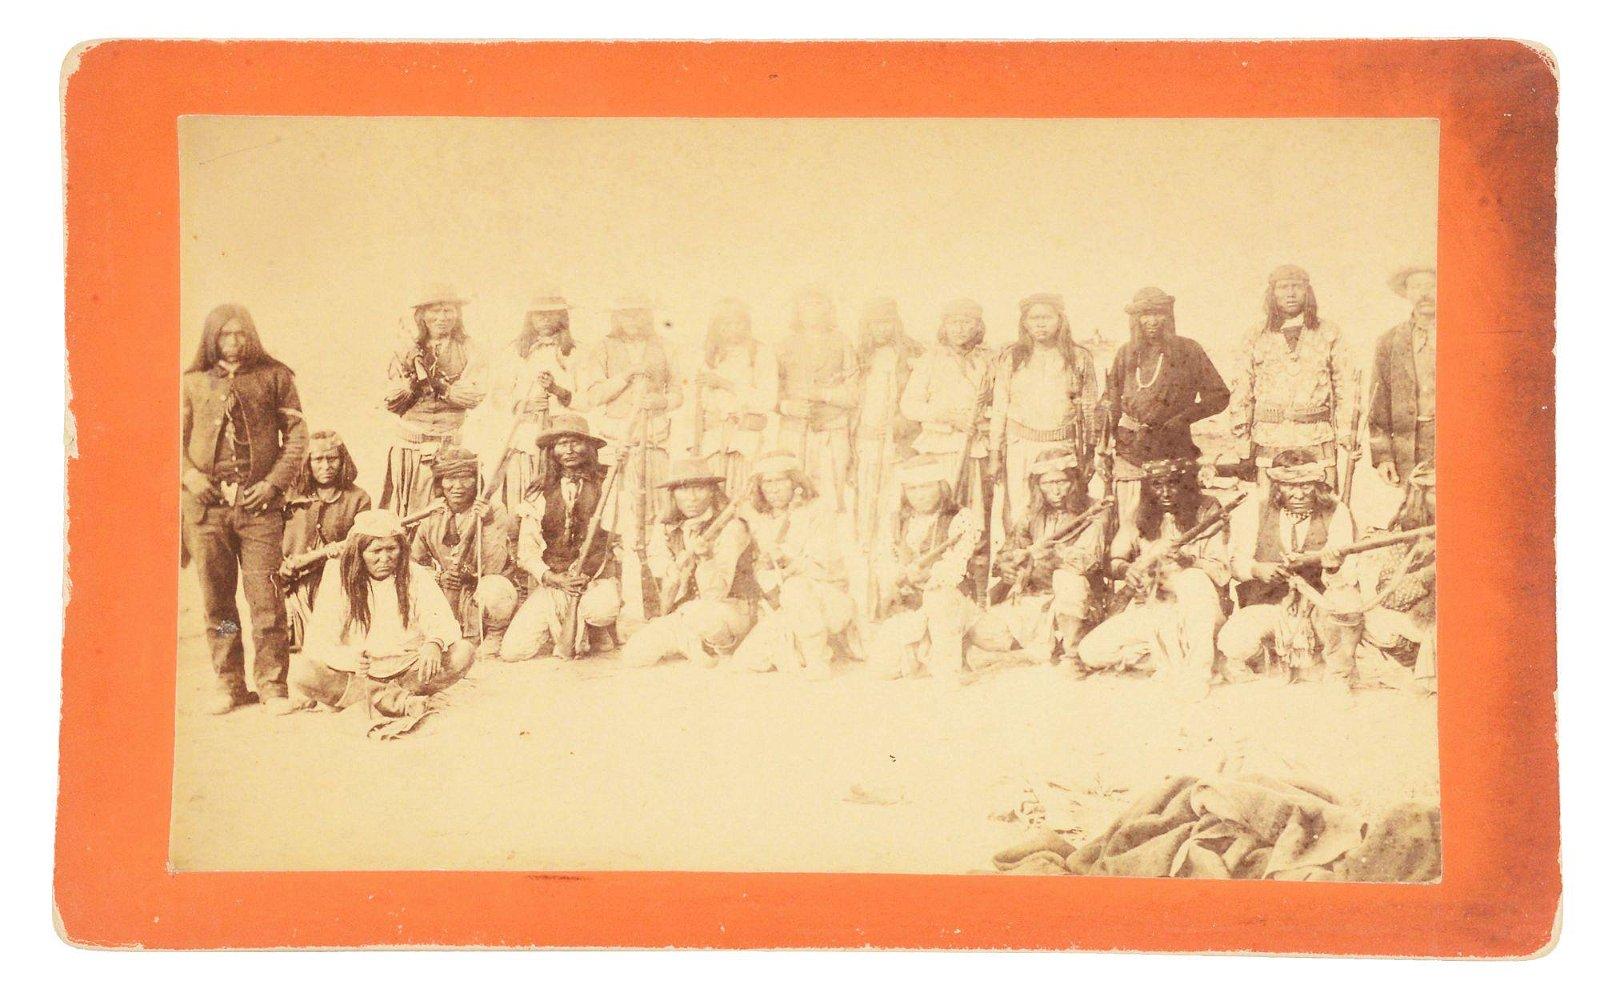 1880'S APACHE SCOUTS GROUP PHOTOGRAPH.